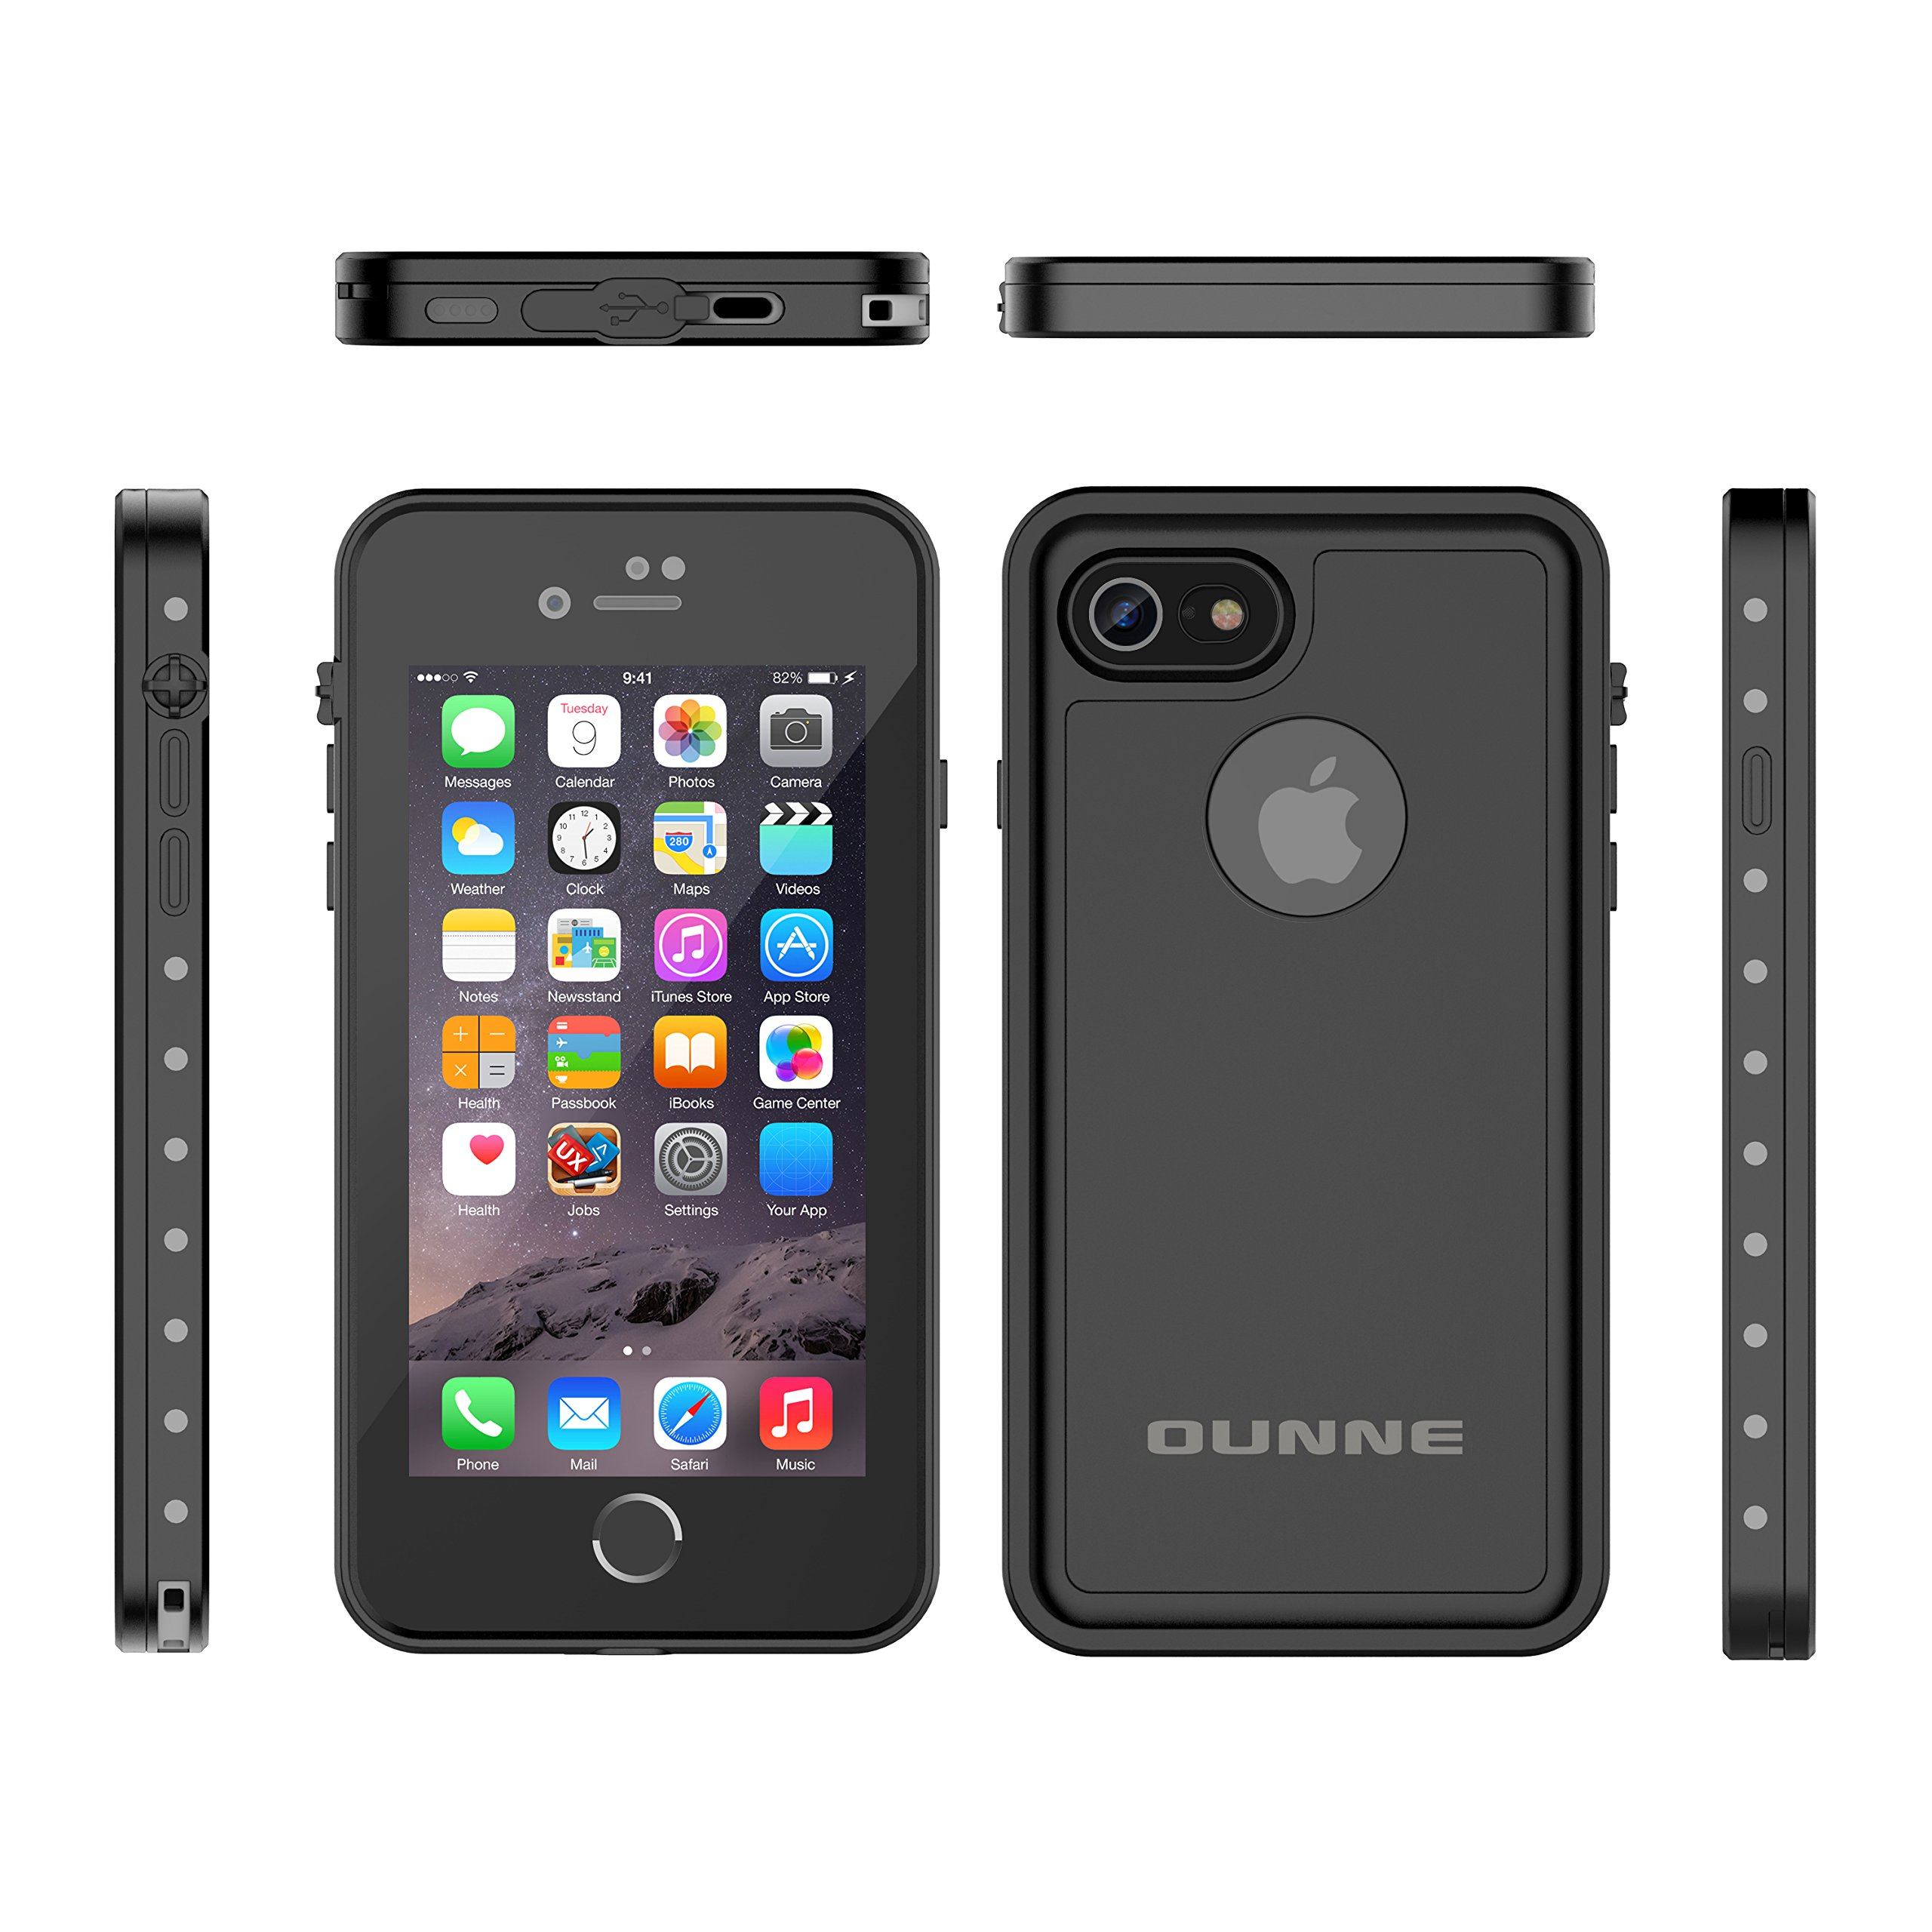 reputable site bff58 3c986 iPhone 7/8 Waterproof Case, OUNNE Underwater Full Sealed Cover ...